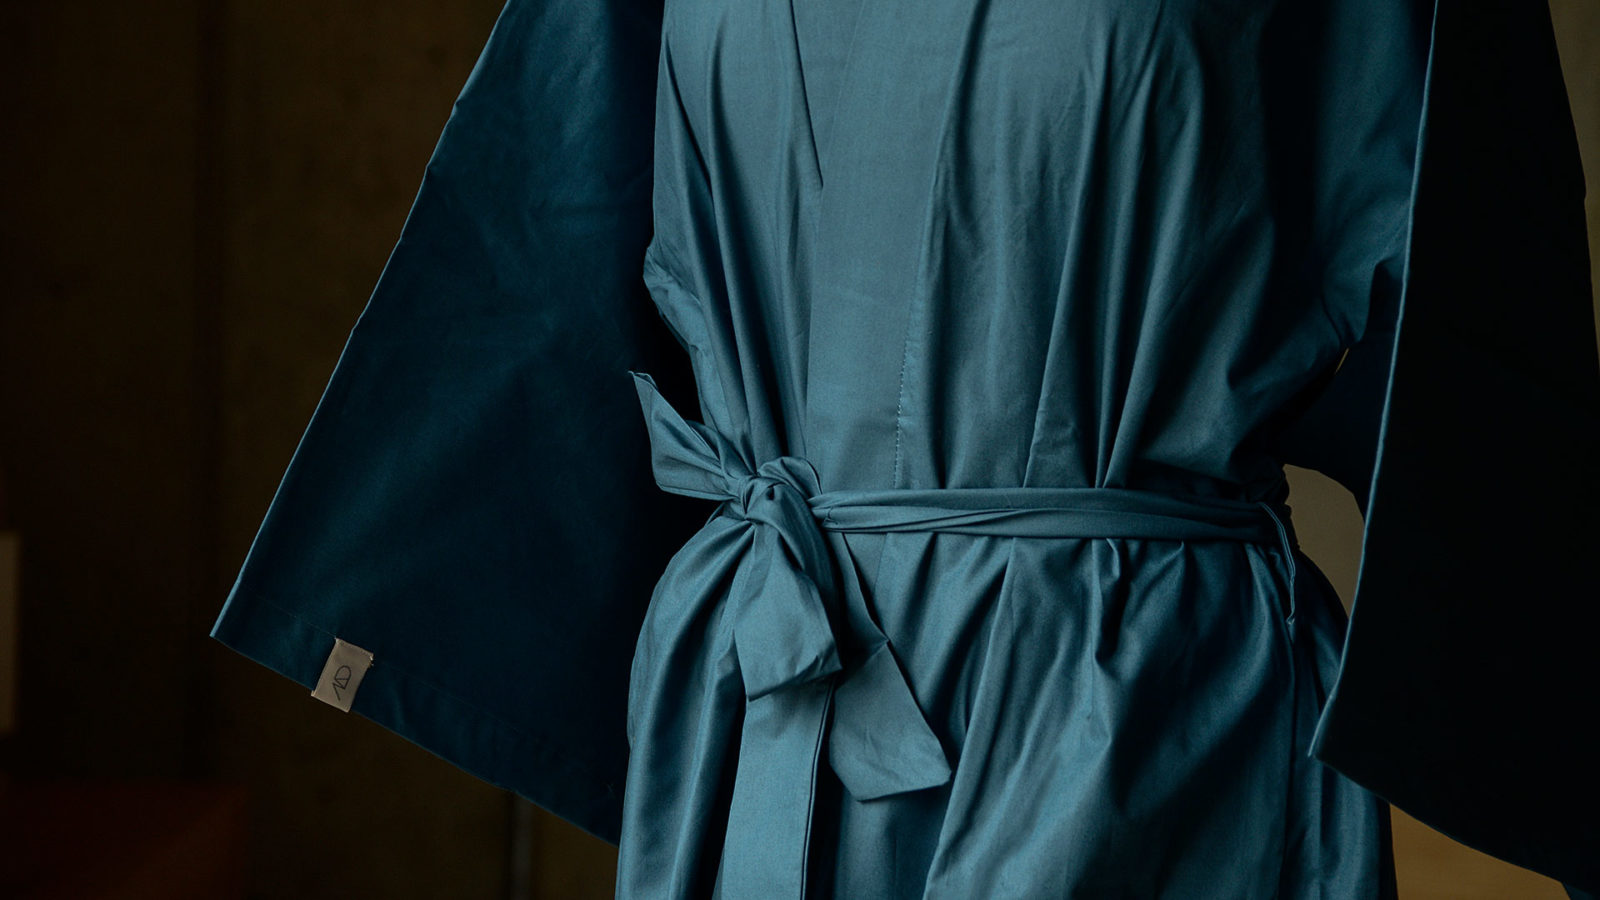 dark teal dressing gown